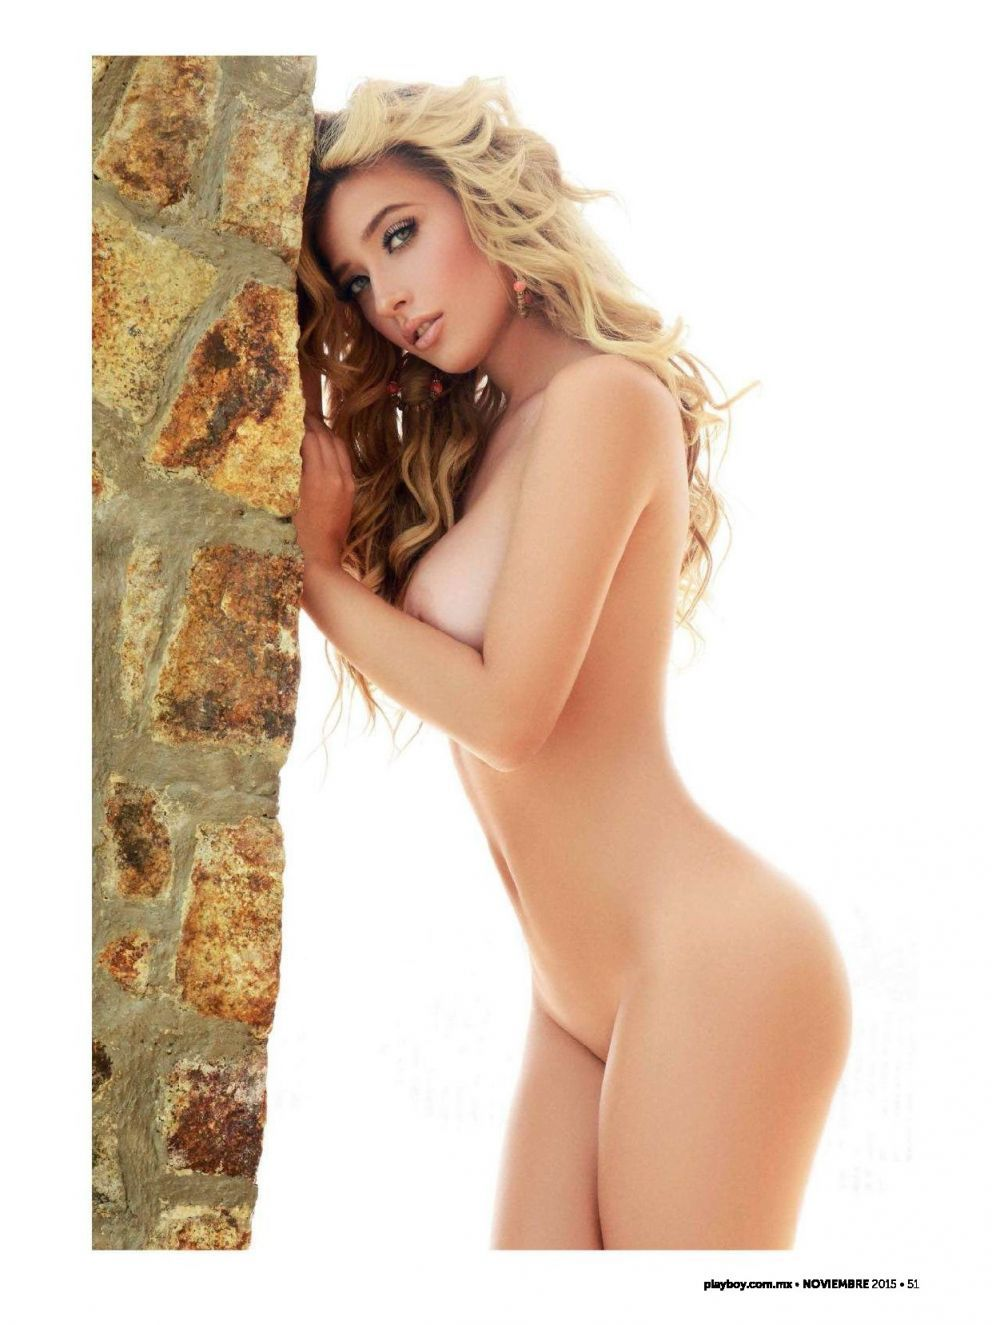 Resultado de imagen para brenda zambrano desnuda